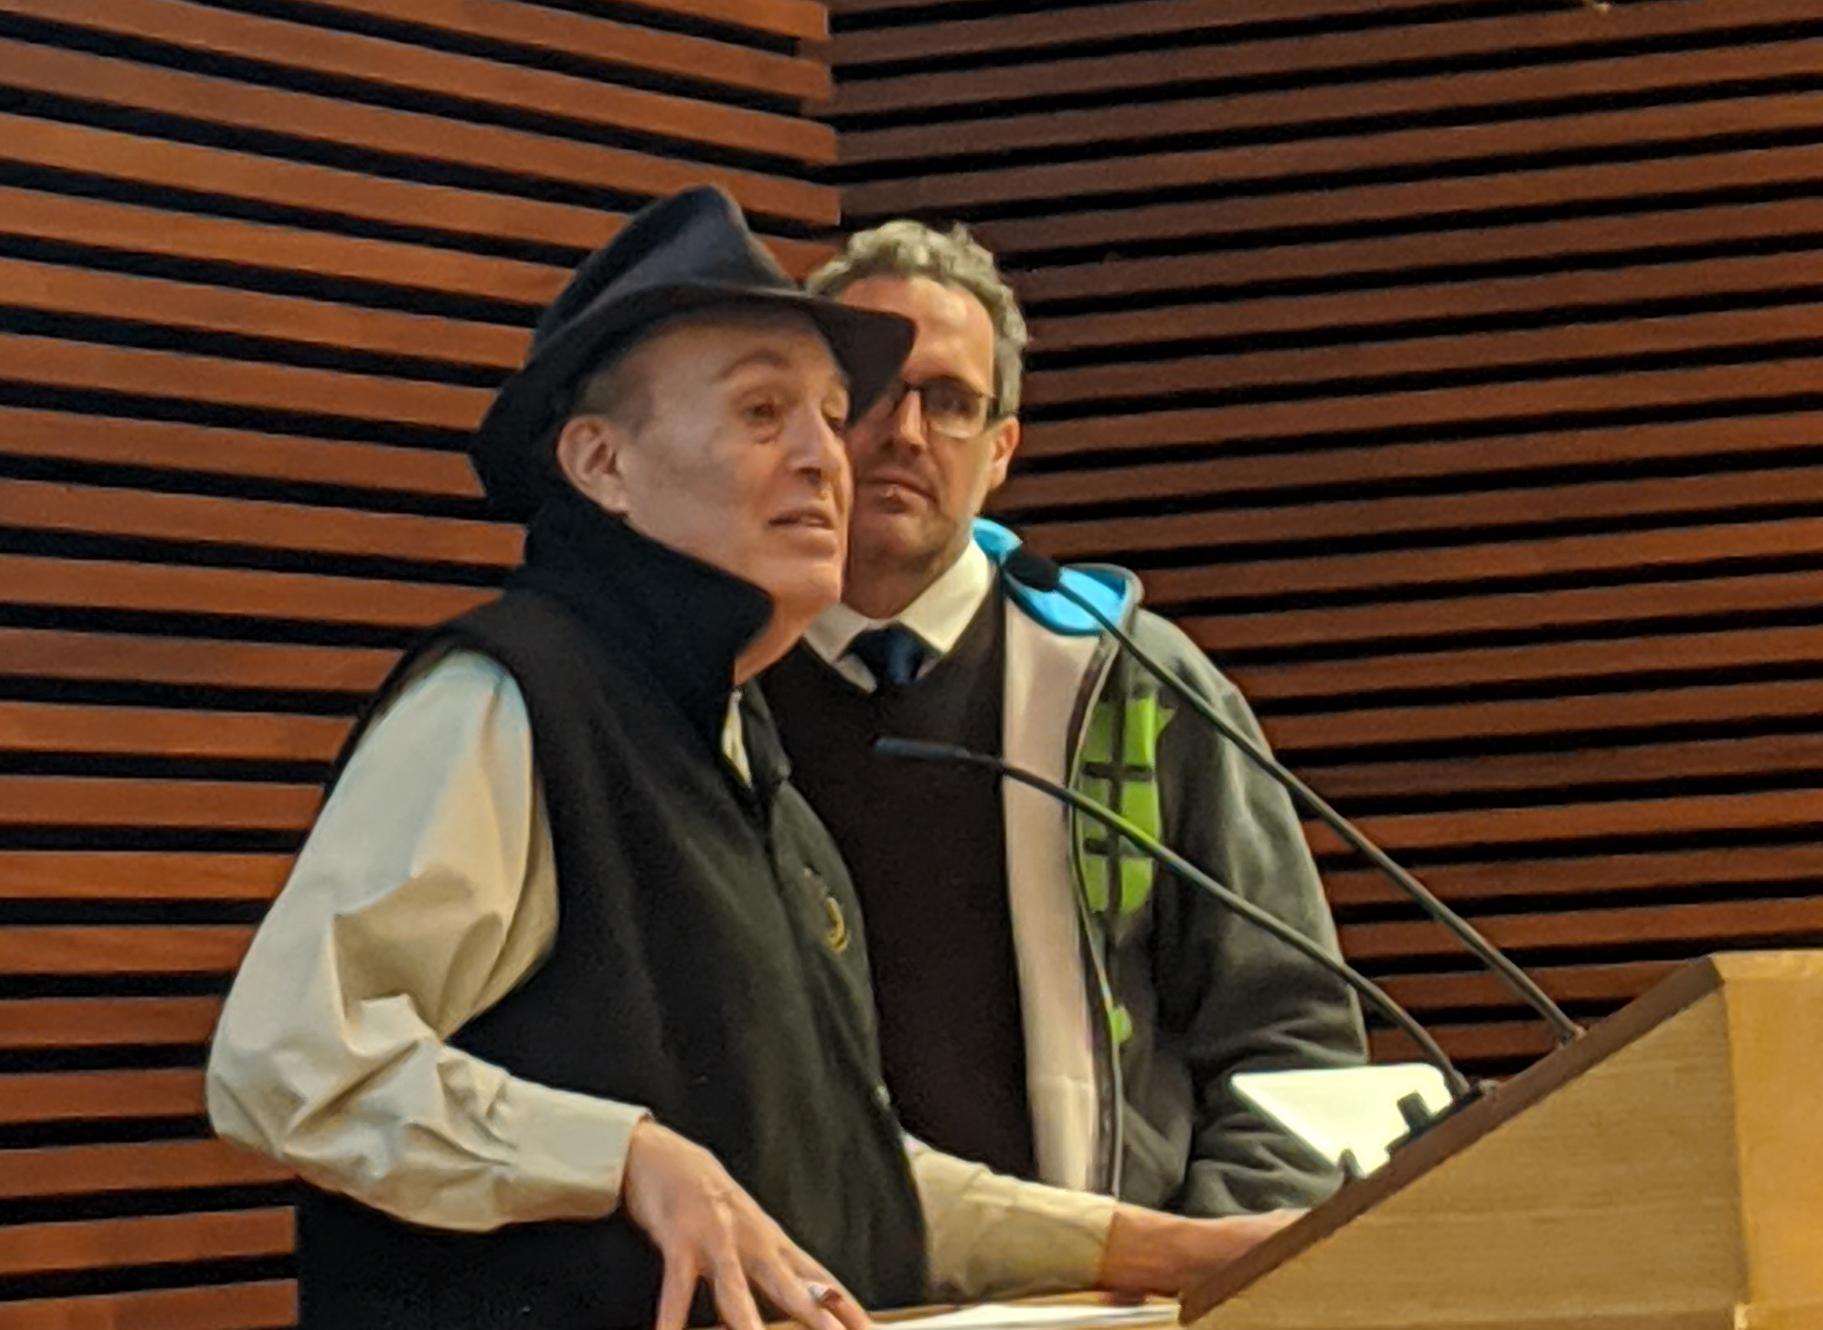 Richard B. Freeman and Rafael Gomez stand at a podium